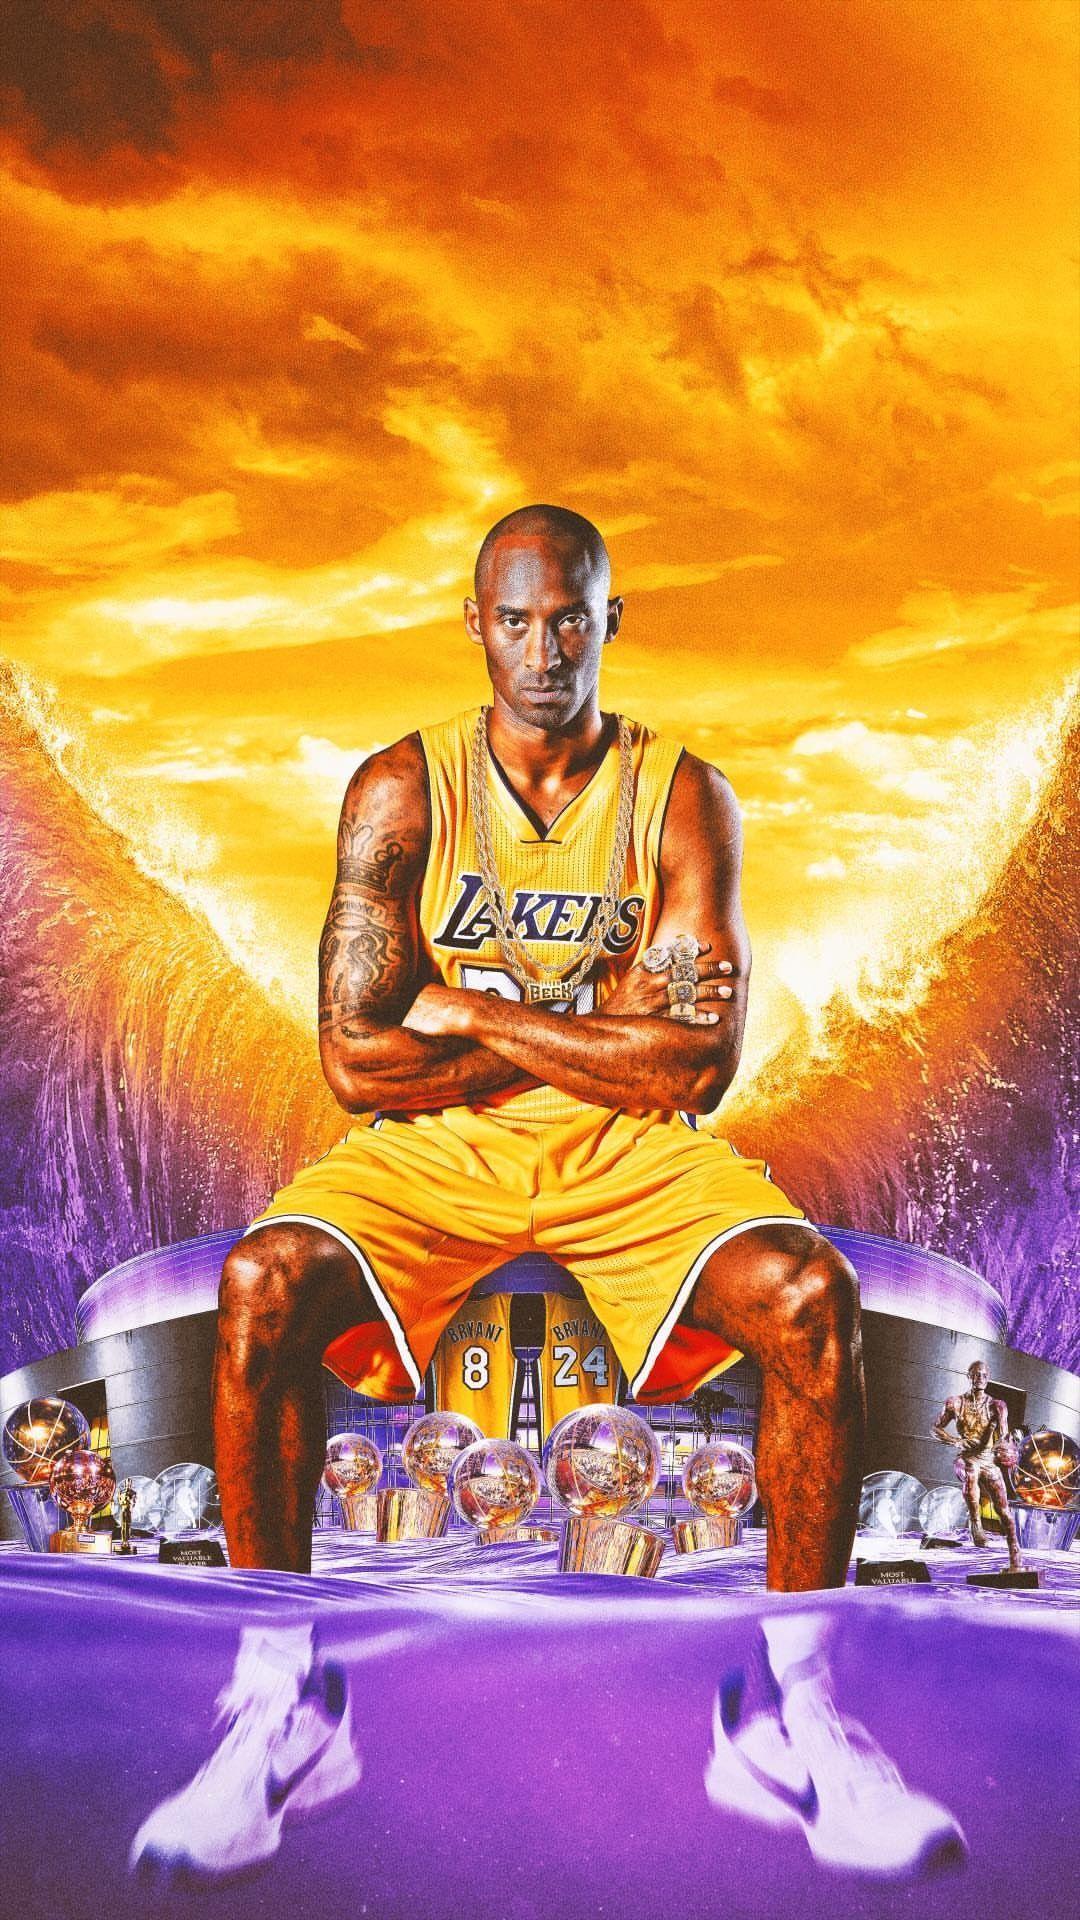 Kobe Bryant Wallpaper Lakers Kobe Bryant Kobe Bryant Pictures Kobe Bryant 24